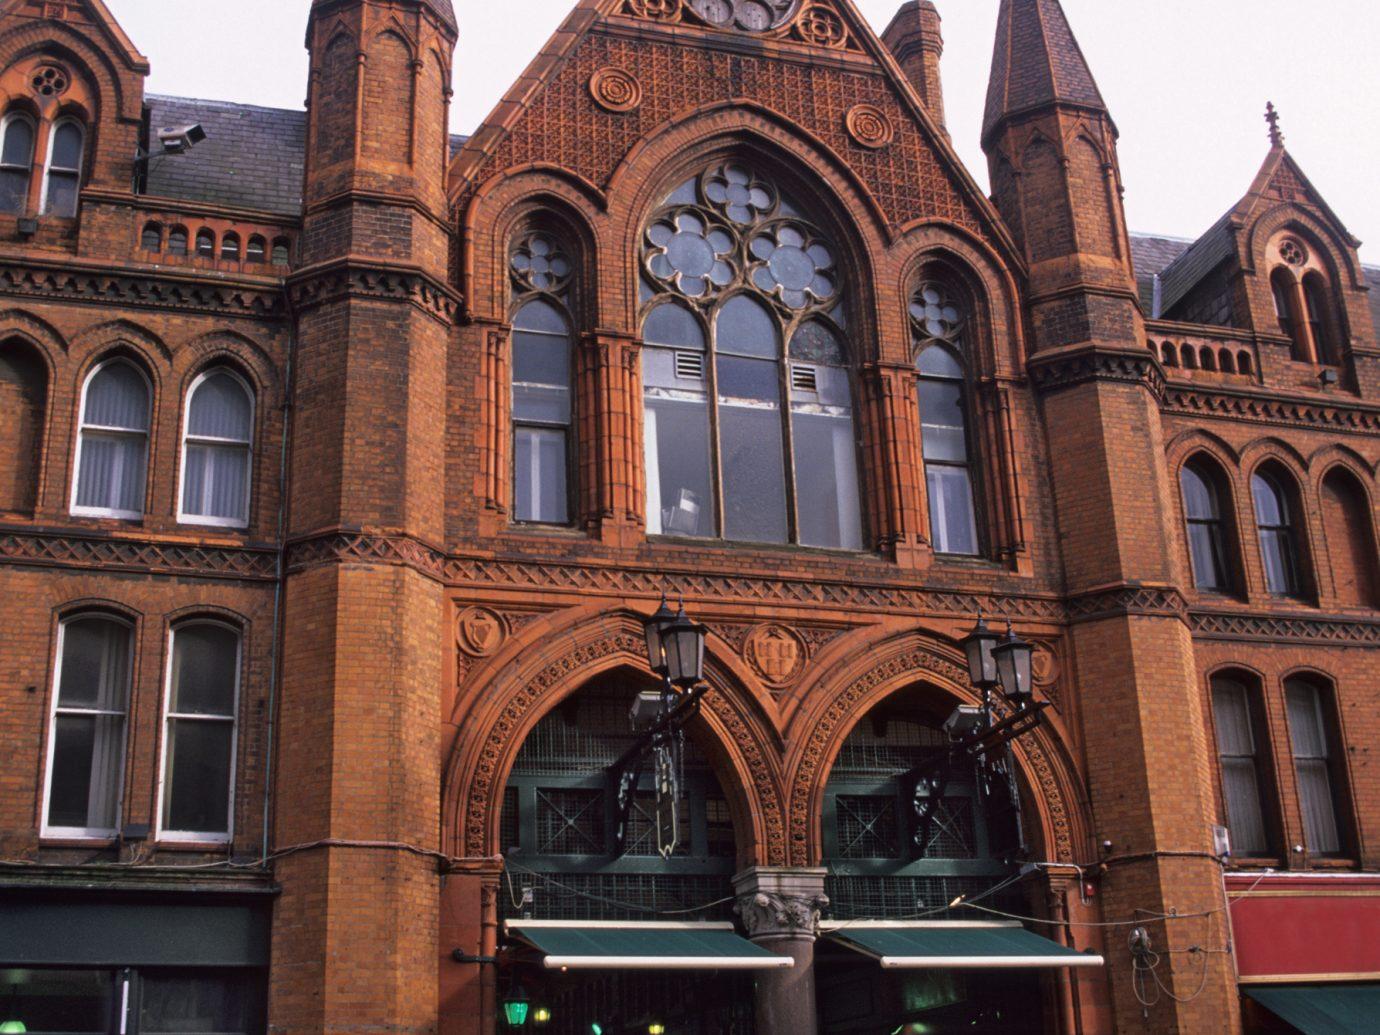 George's Street Arcade, a shopping centre in Dublin, Ireland.